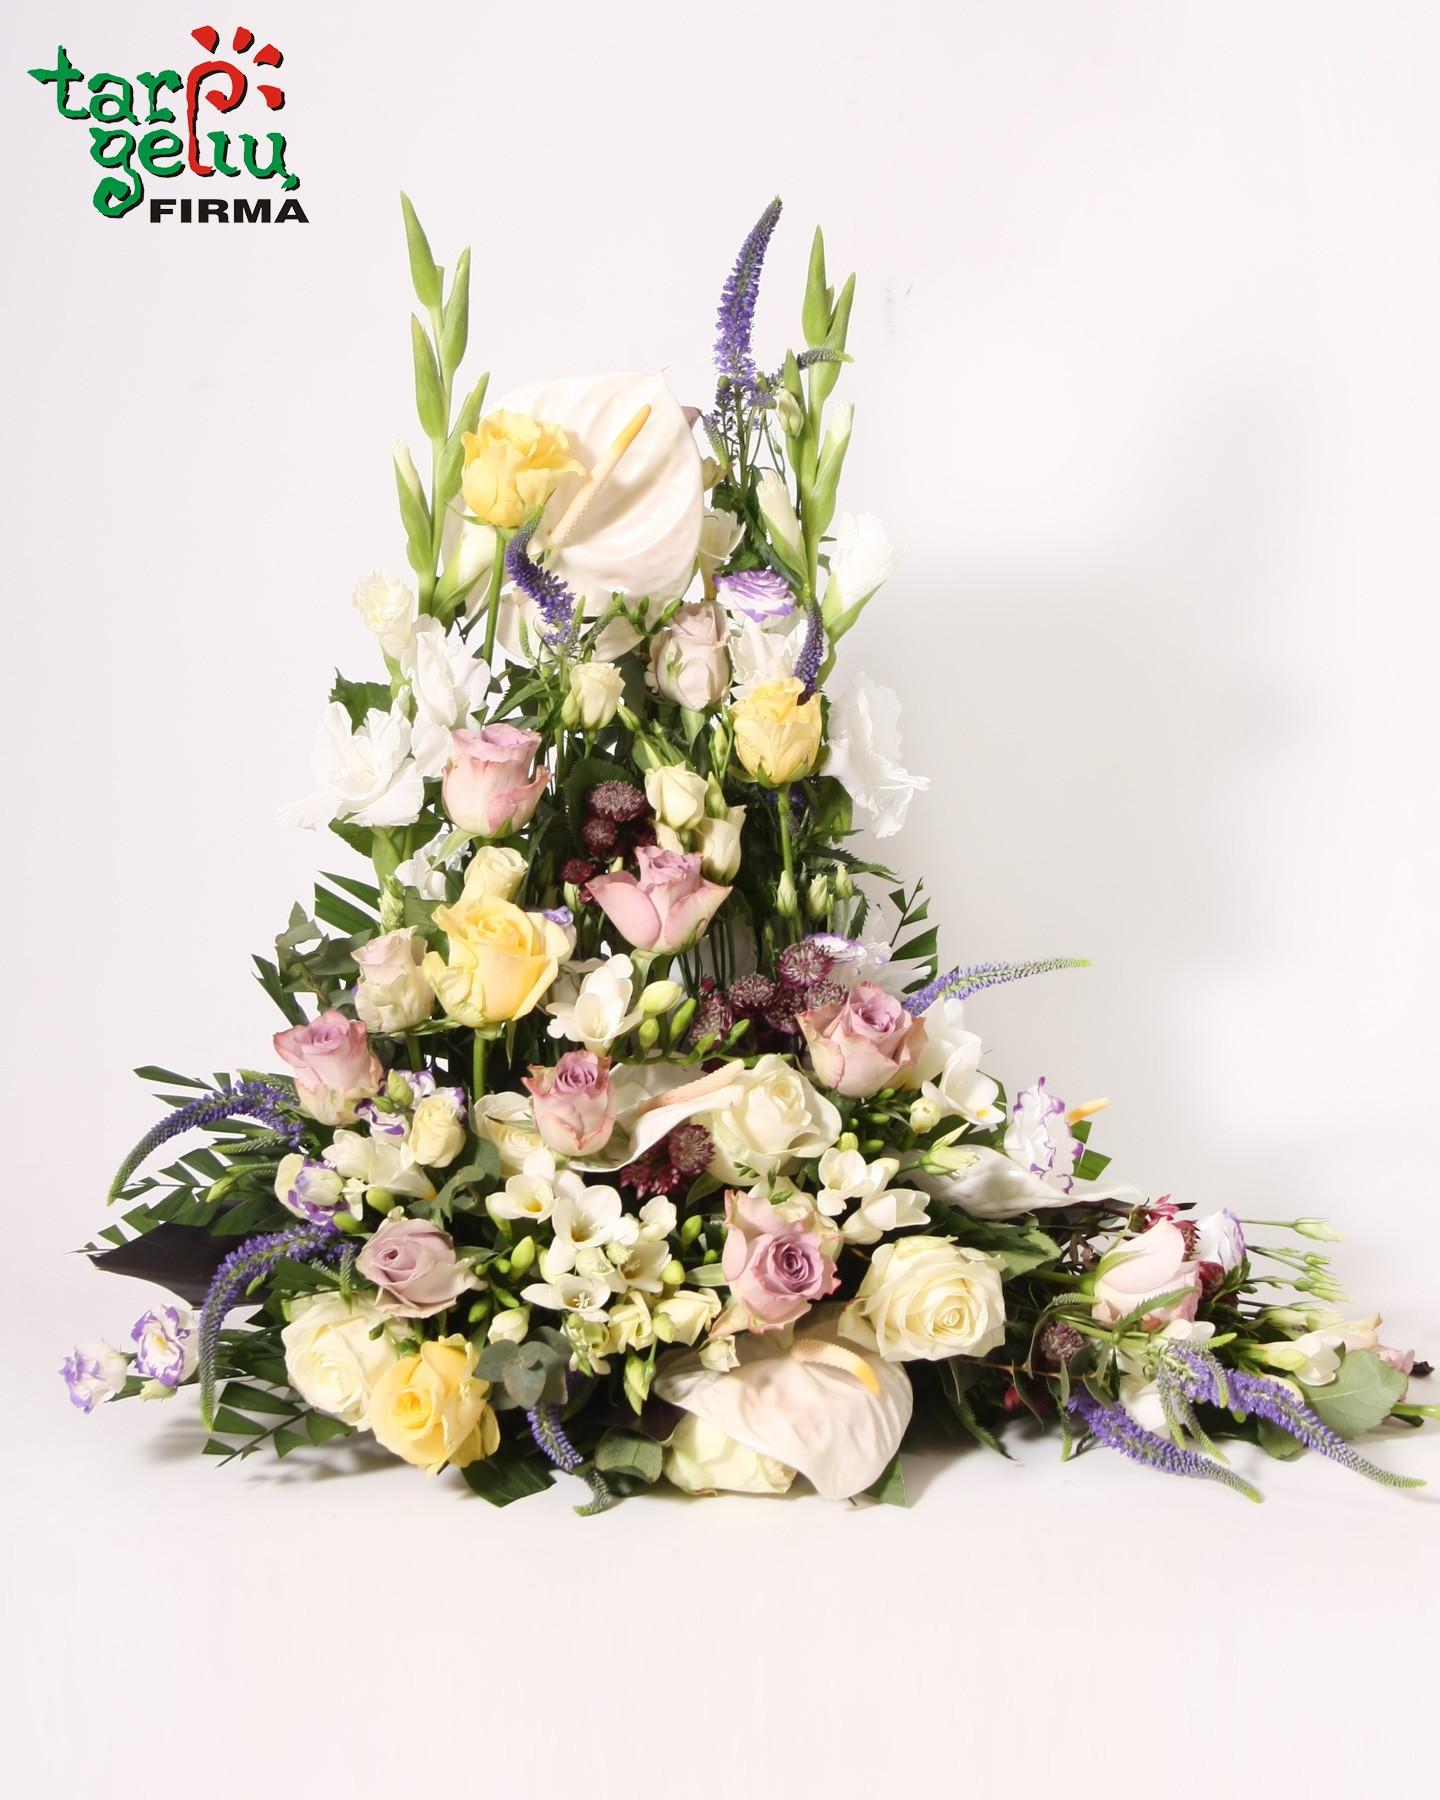 Elegant Funeral Arrangement Funeral Boquets Funeral